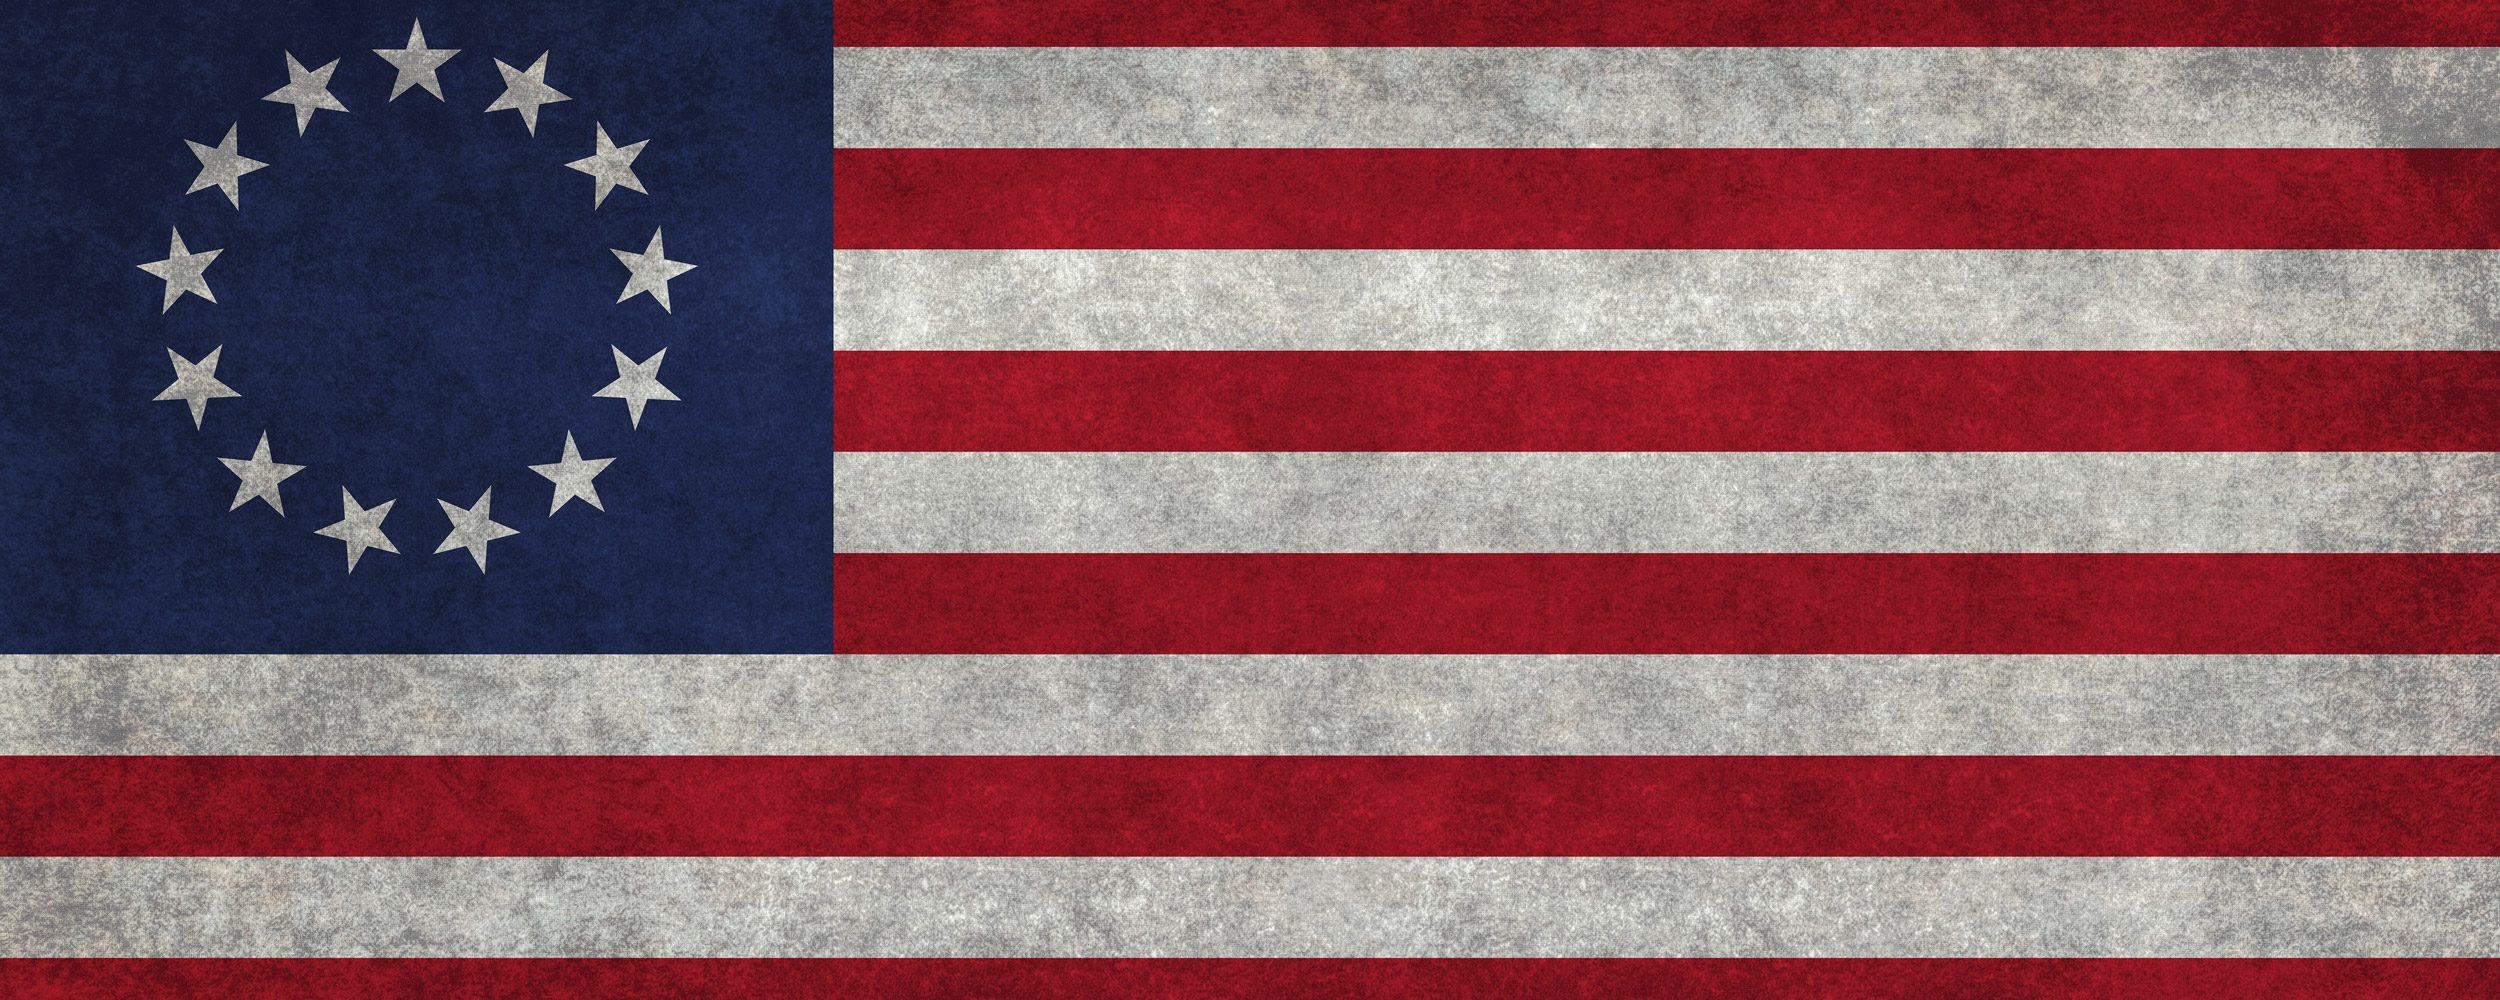 https://amerikaroman.de/wp-content/uploads/2020/05/flagge2-2500x1000.jpg